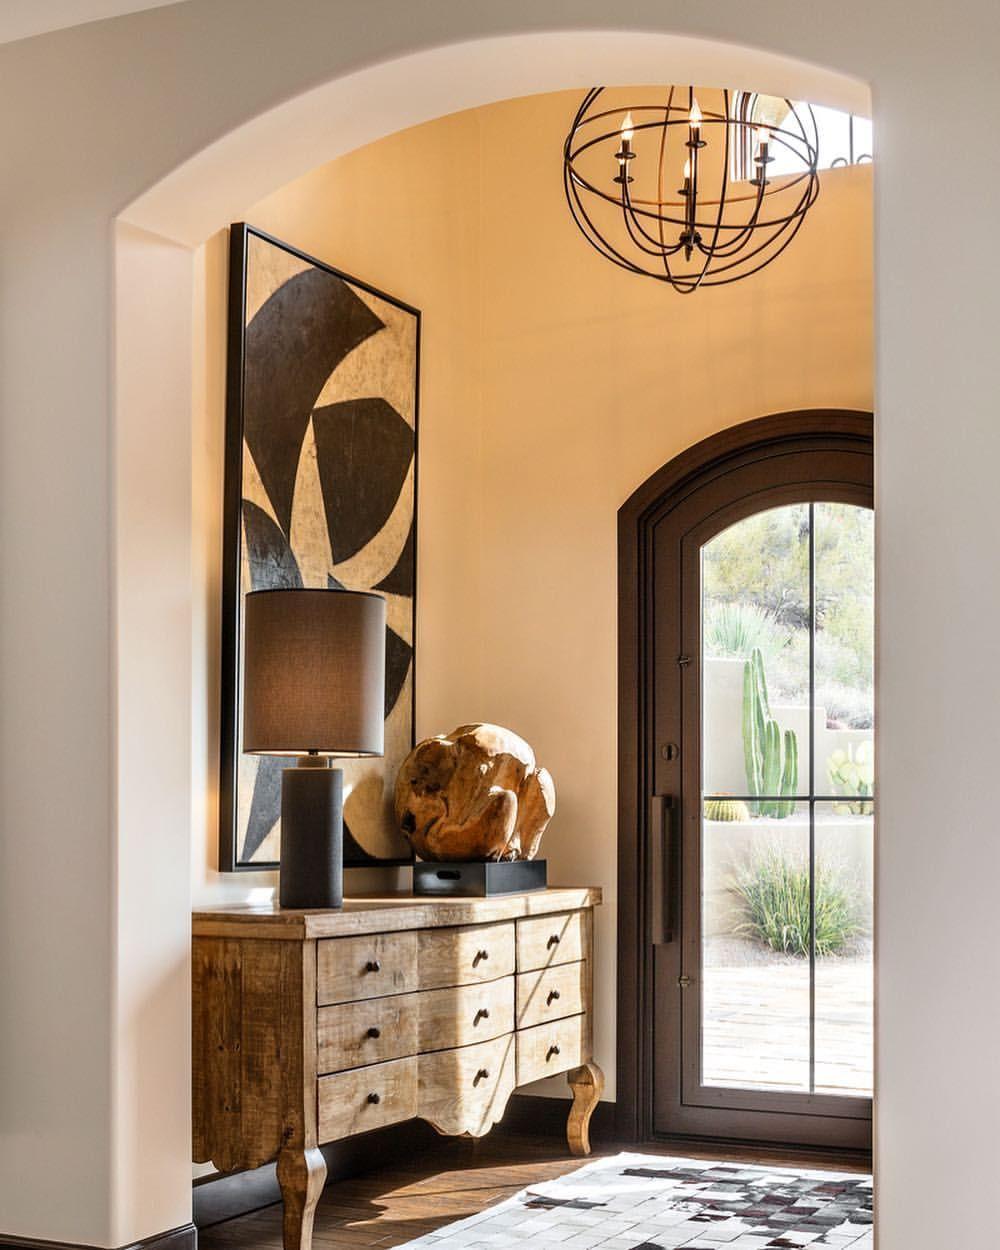 Entry hallway furniture  Instant warmth LuxeAtHome sandow  Phot  DECORATING HOME